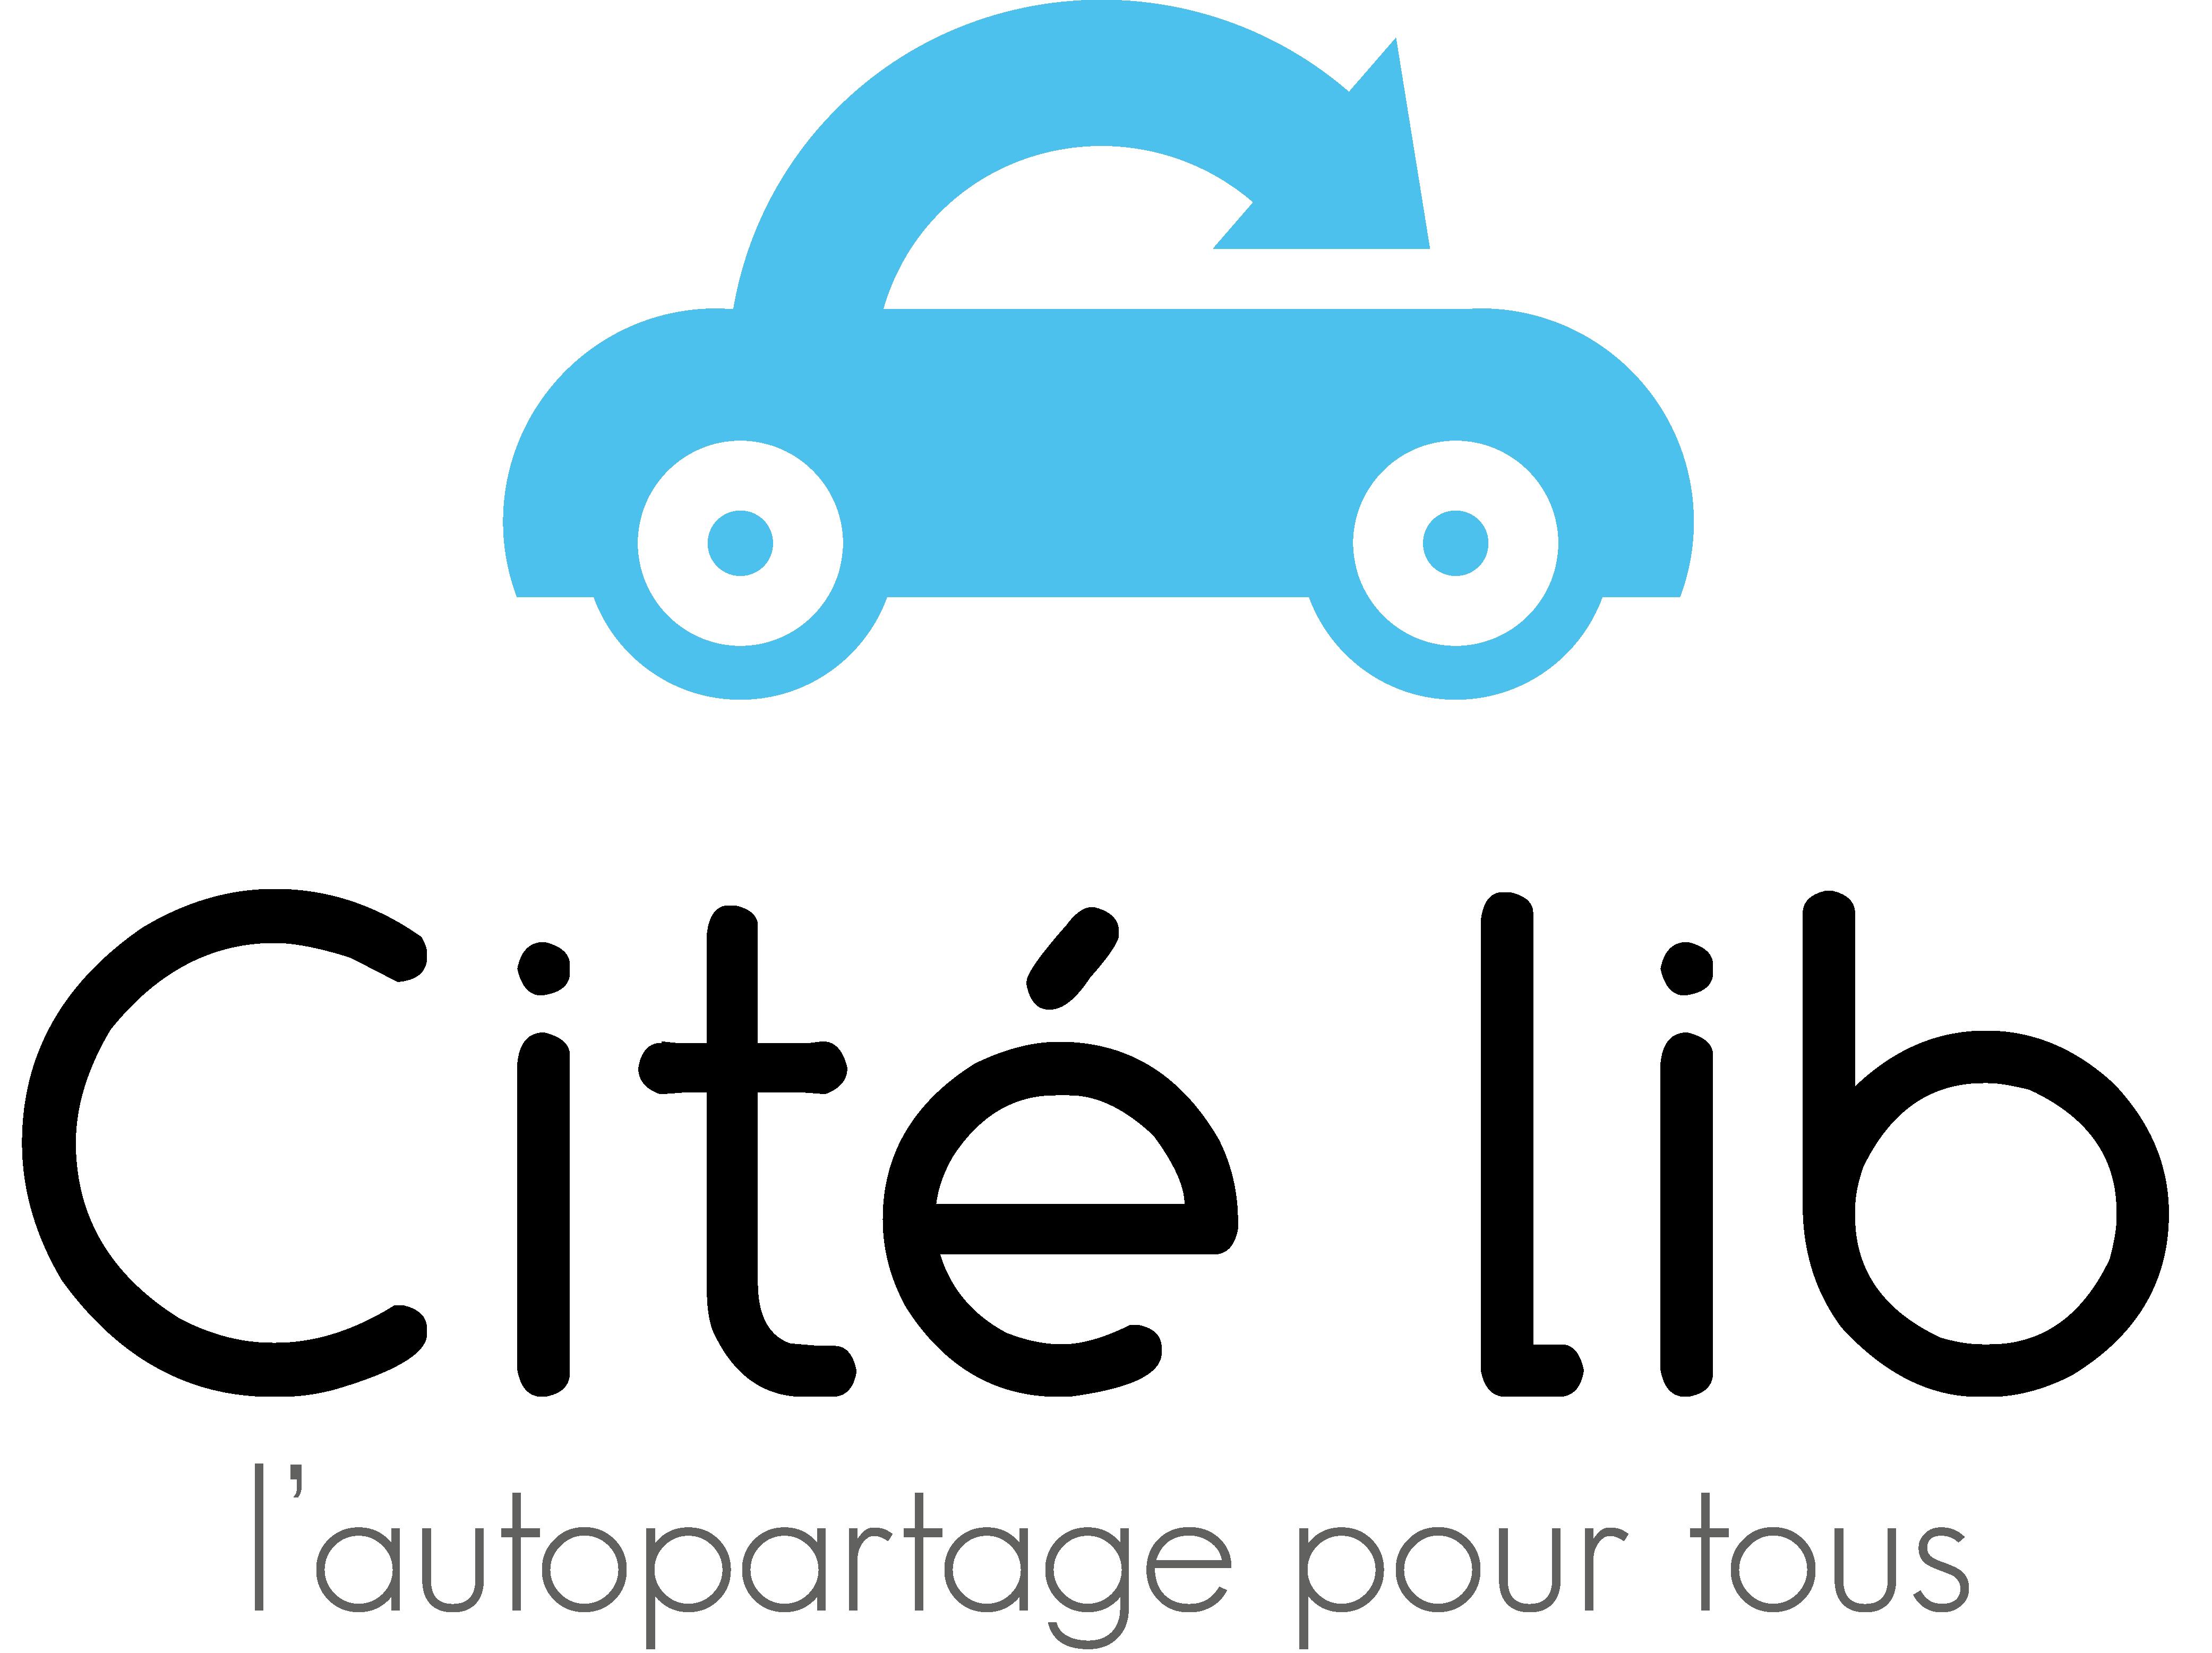 logo_citelib[1]